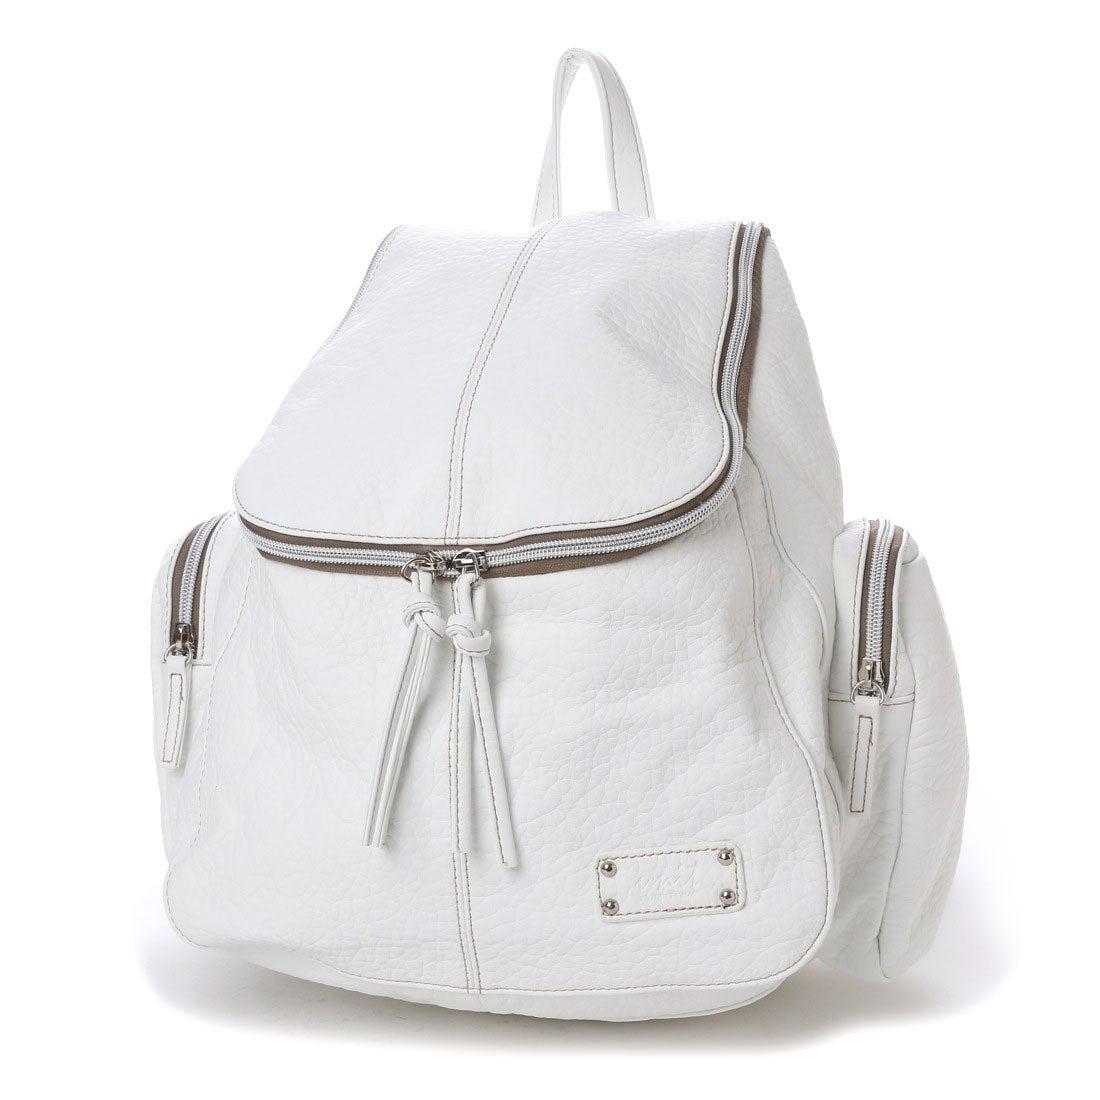 8da412014657 サック SAC ファルコ(ホワイト)【SAC unit】 -靴&ファッション通販 ロコンド〜自宅で試着、気軽に返品